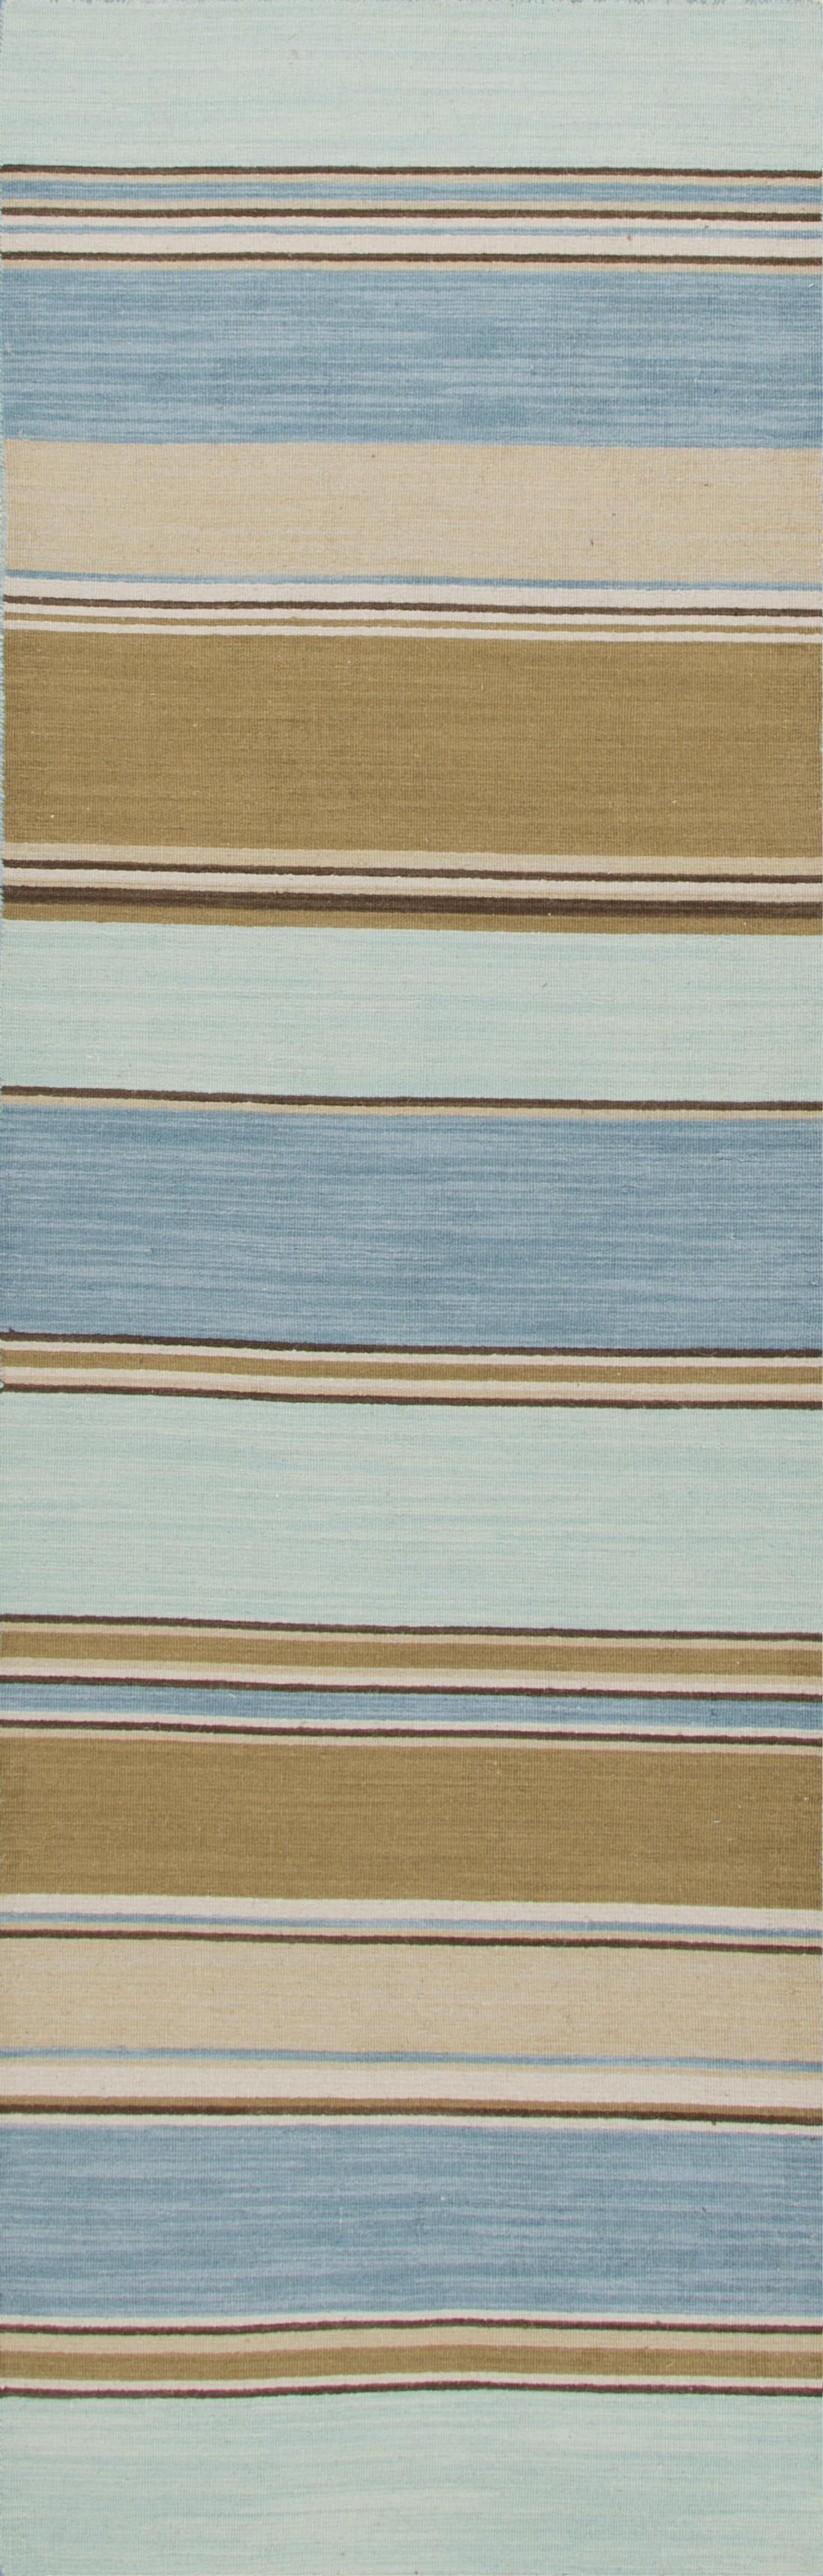 JAIPUR Rugs Coastal Shores 2.6 x 8 Rug - Item Number: RUG122435